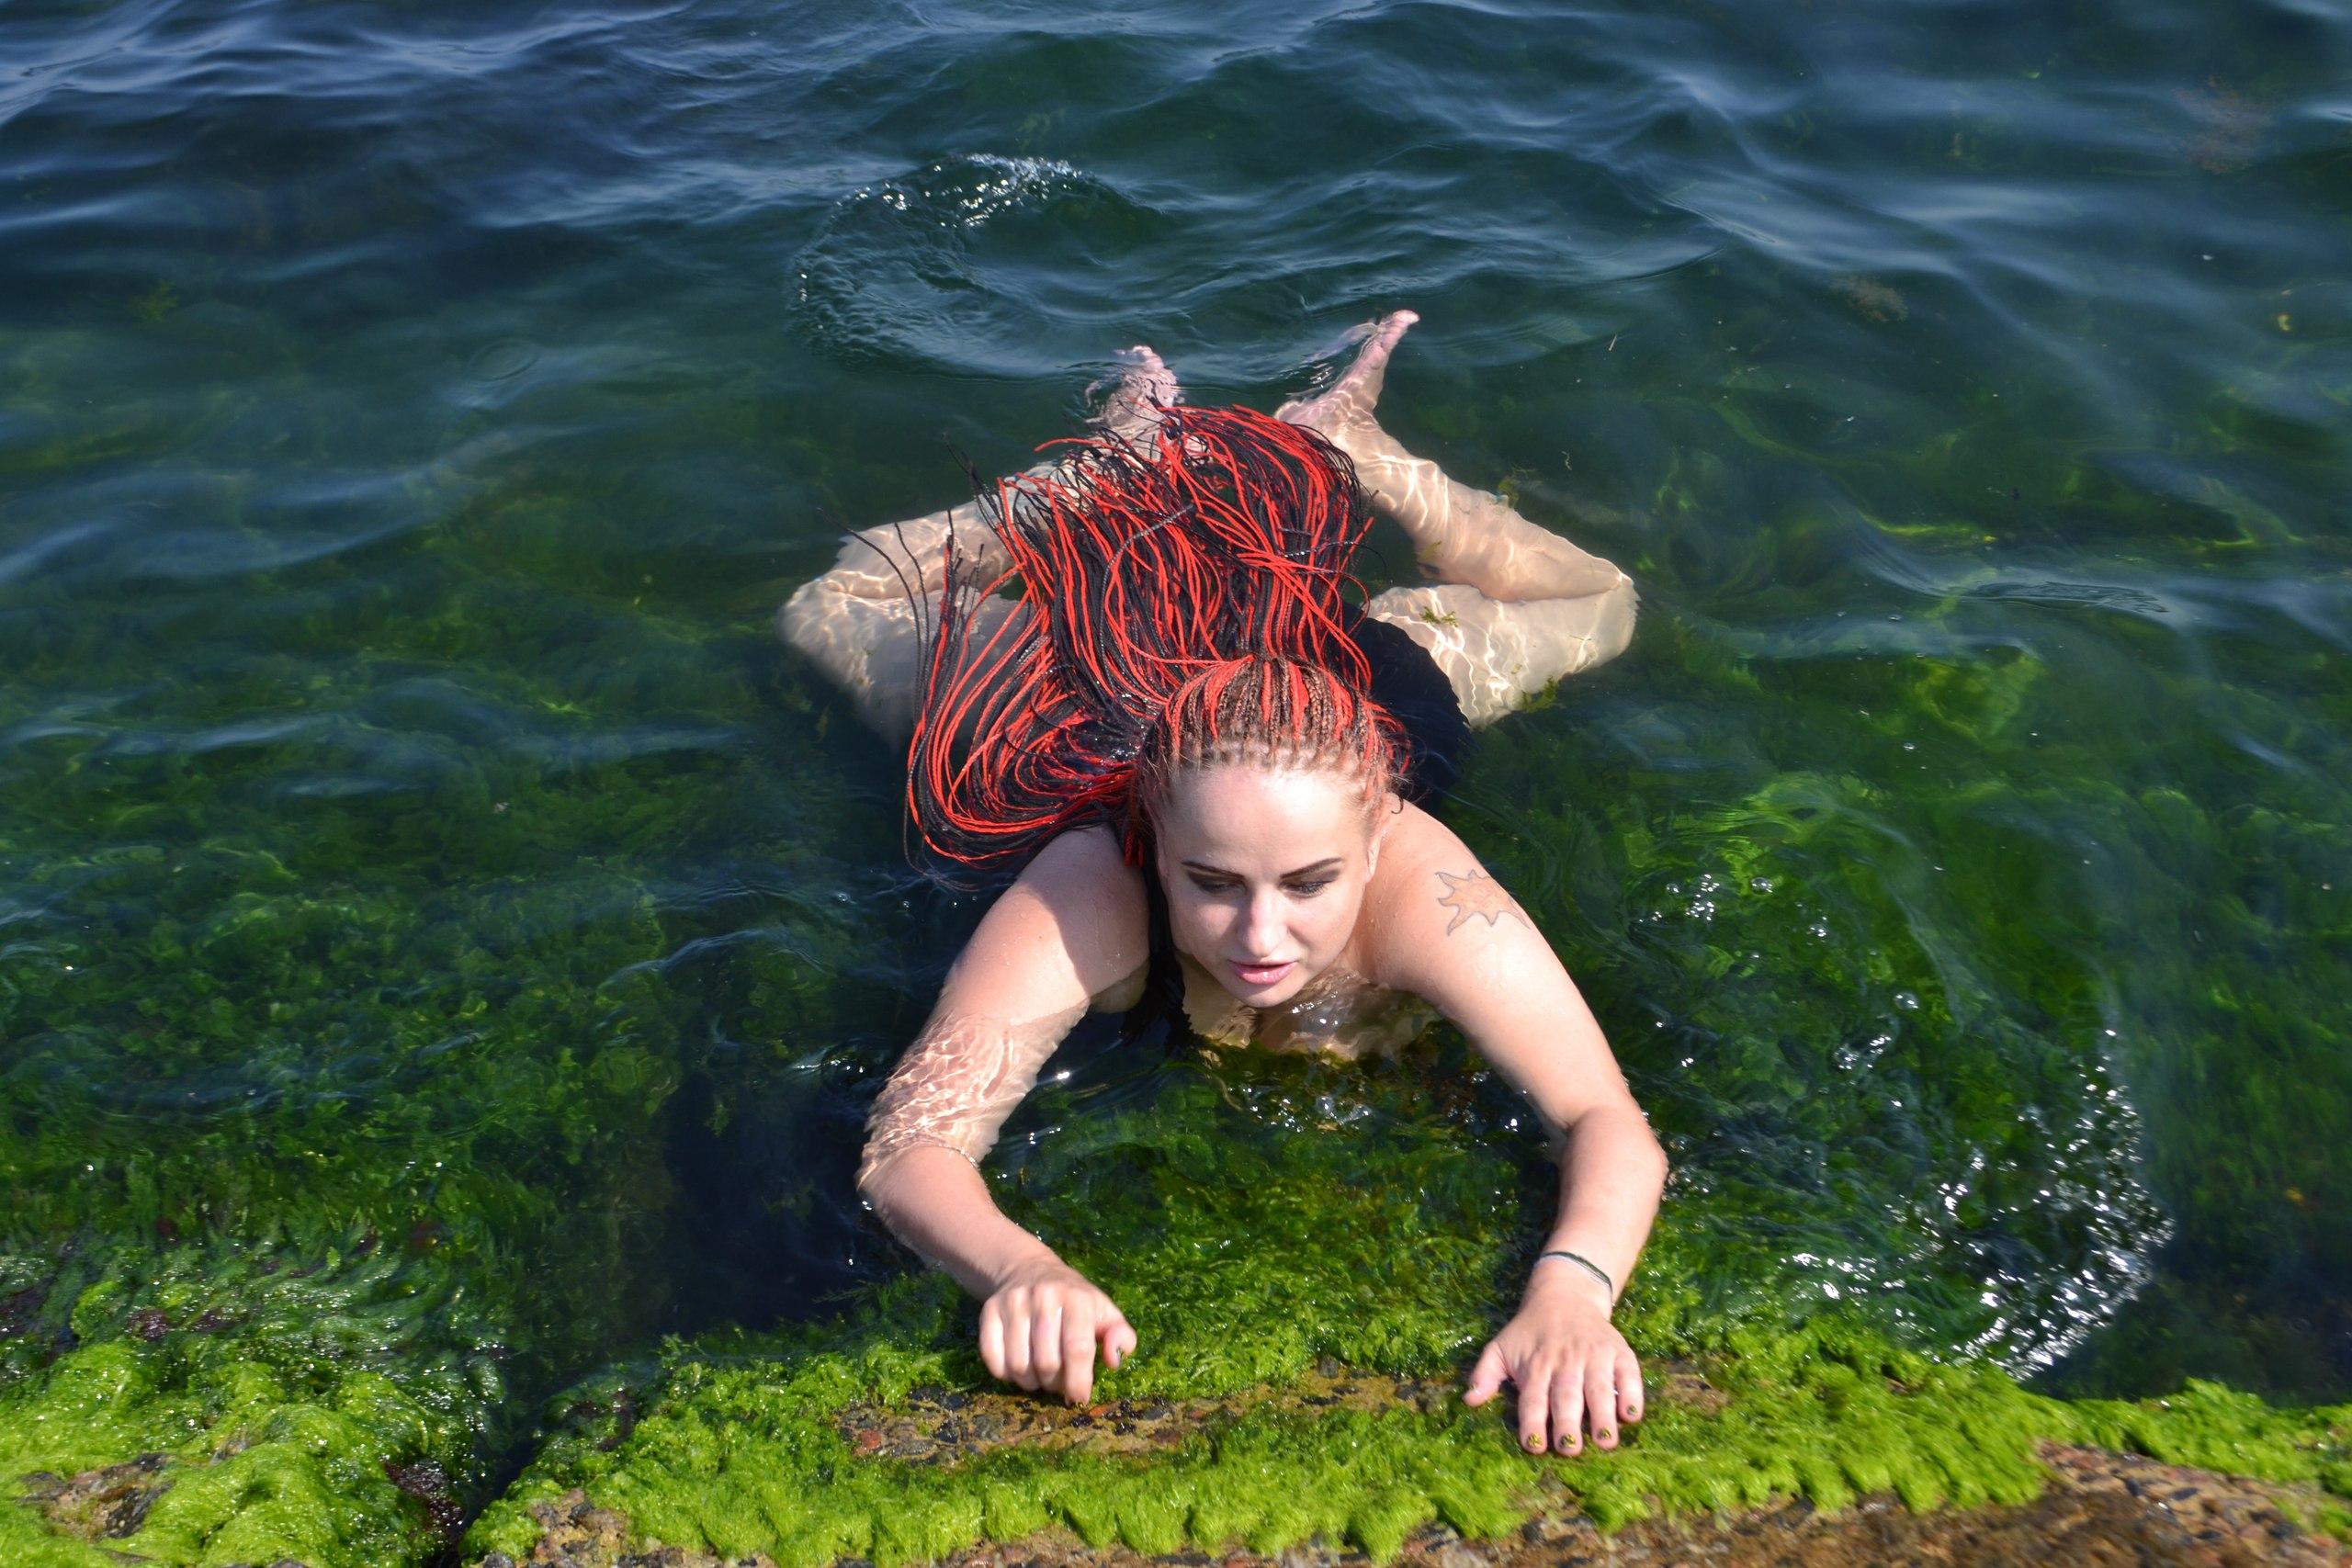 Елена Руденко (Валтея) Украина. Одесса. 17-21 августа 2016 г. SF01KJAfwK8